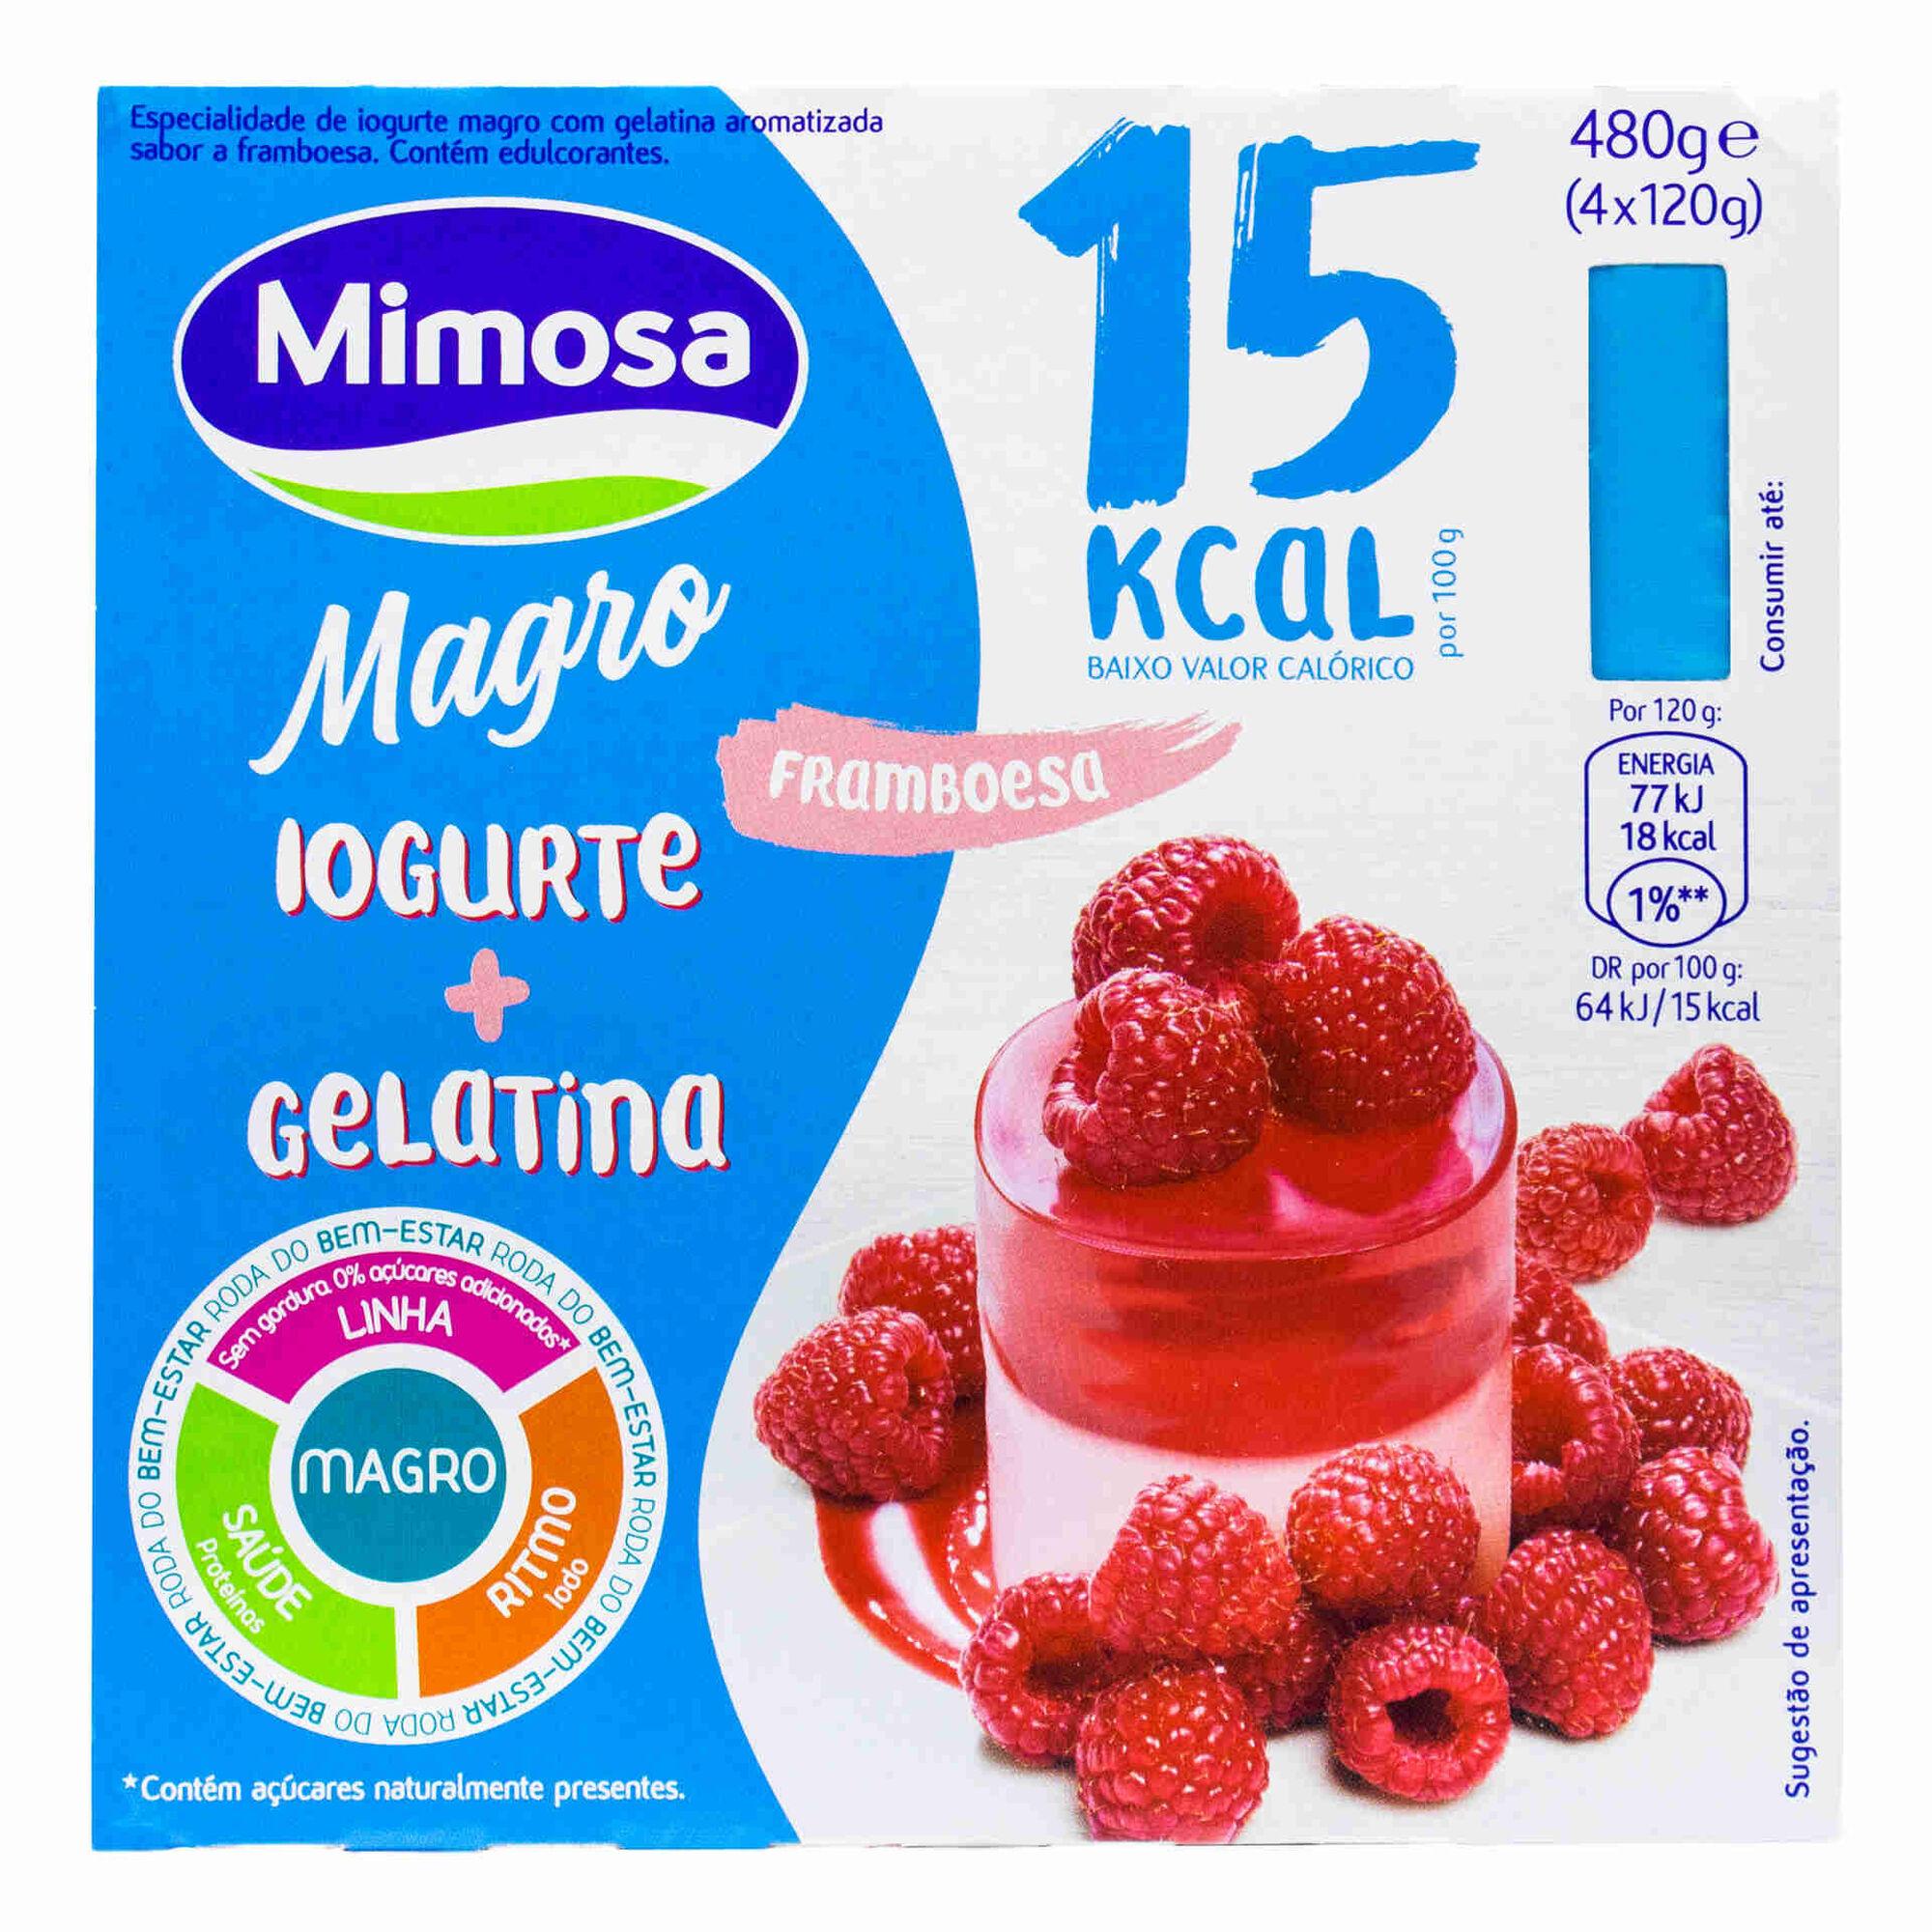 Iogurte e Gelatina Magro Framboesa